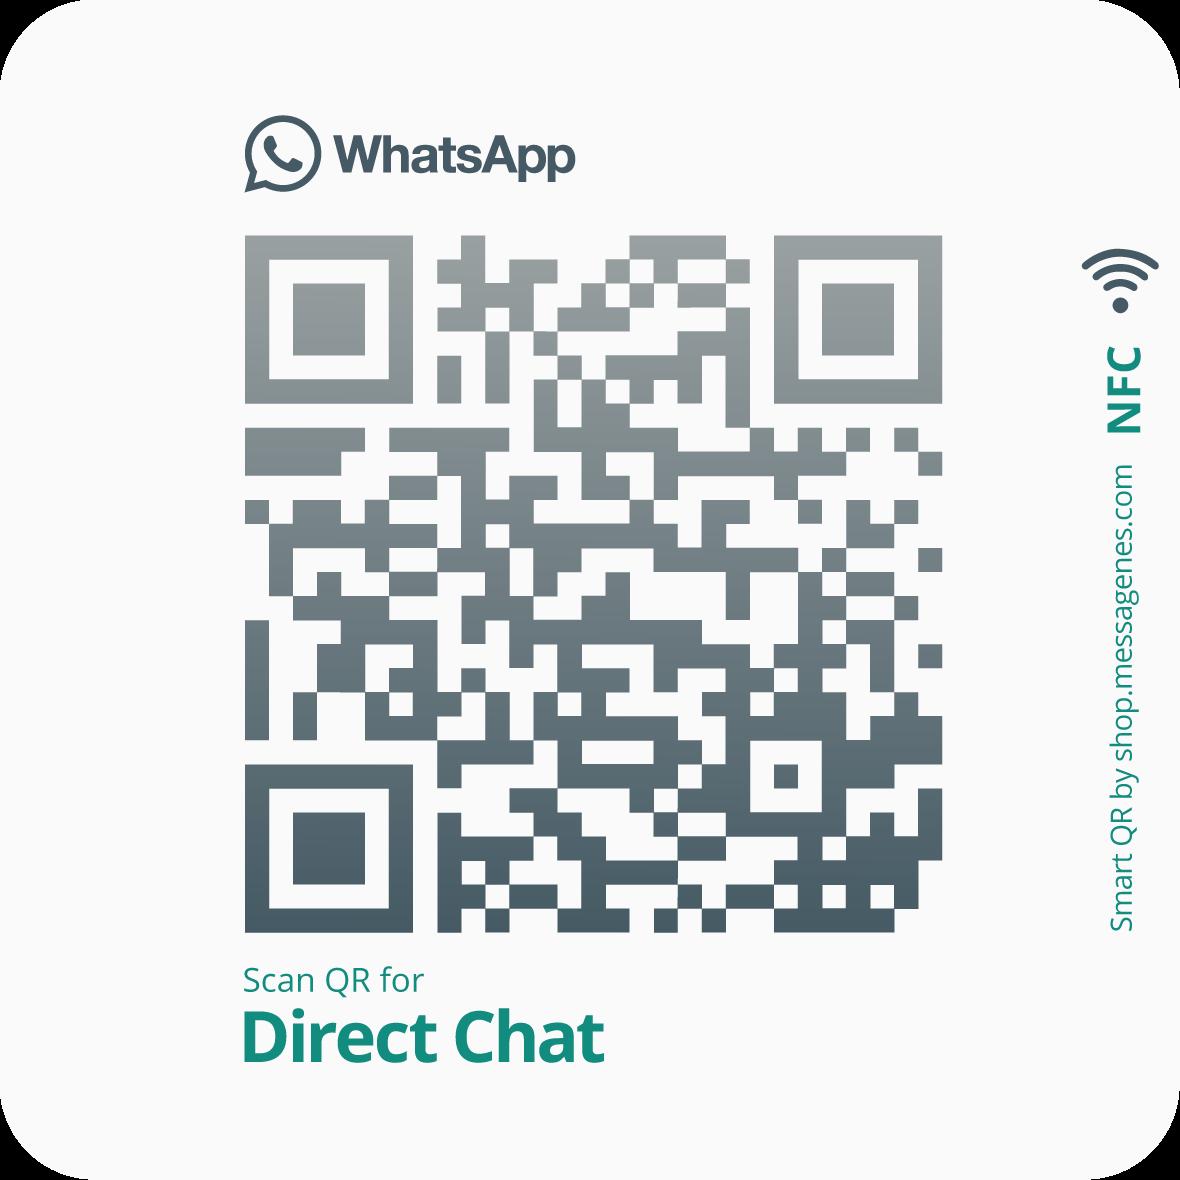 WhatsApp QR and NFC